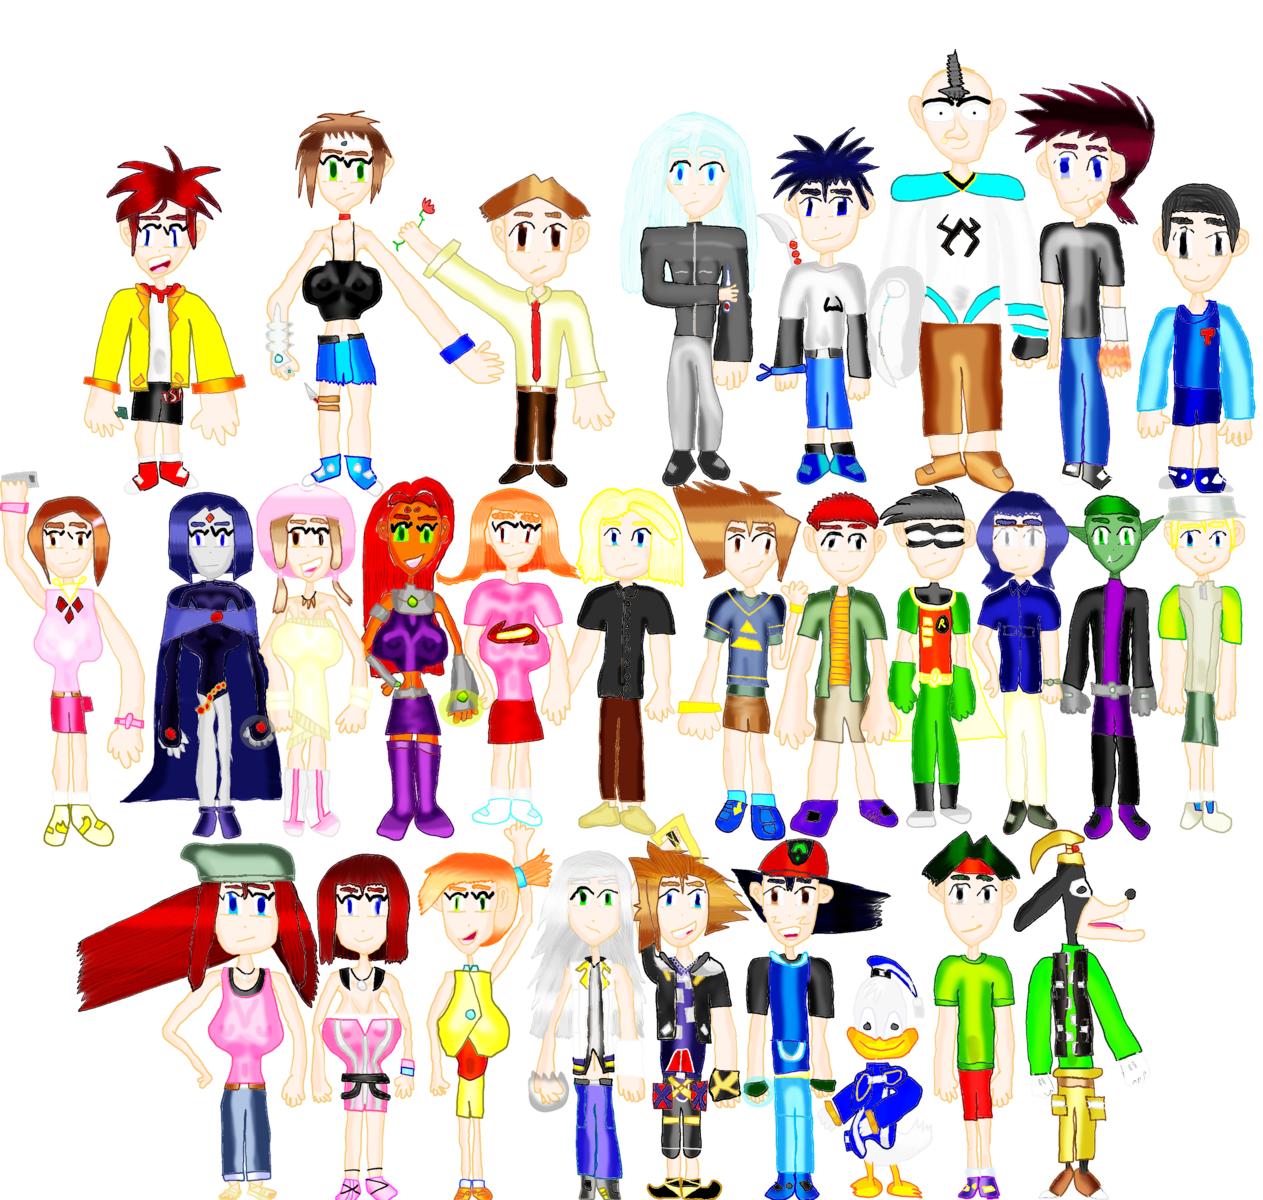 1146429783_Zaksfavorite(animesque)characters.png.4e0984c2421f91bd2c2473ecc8ab7a32.png